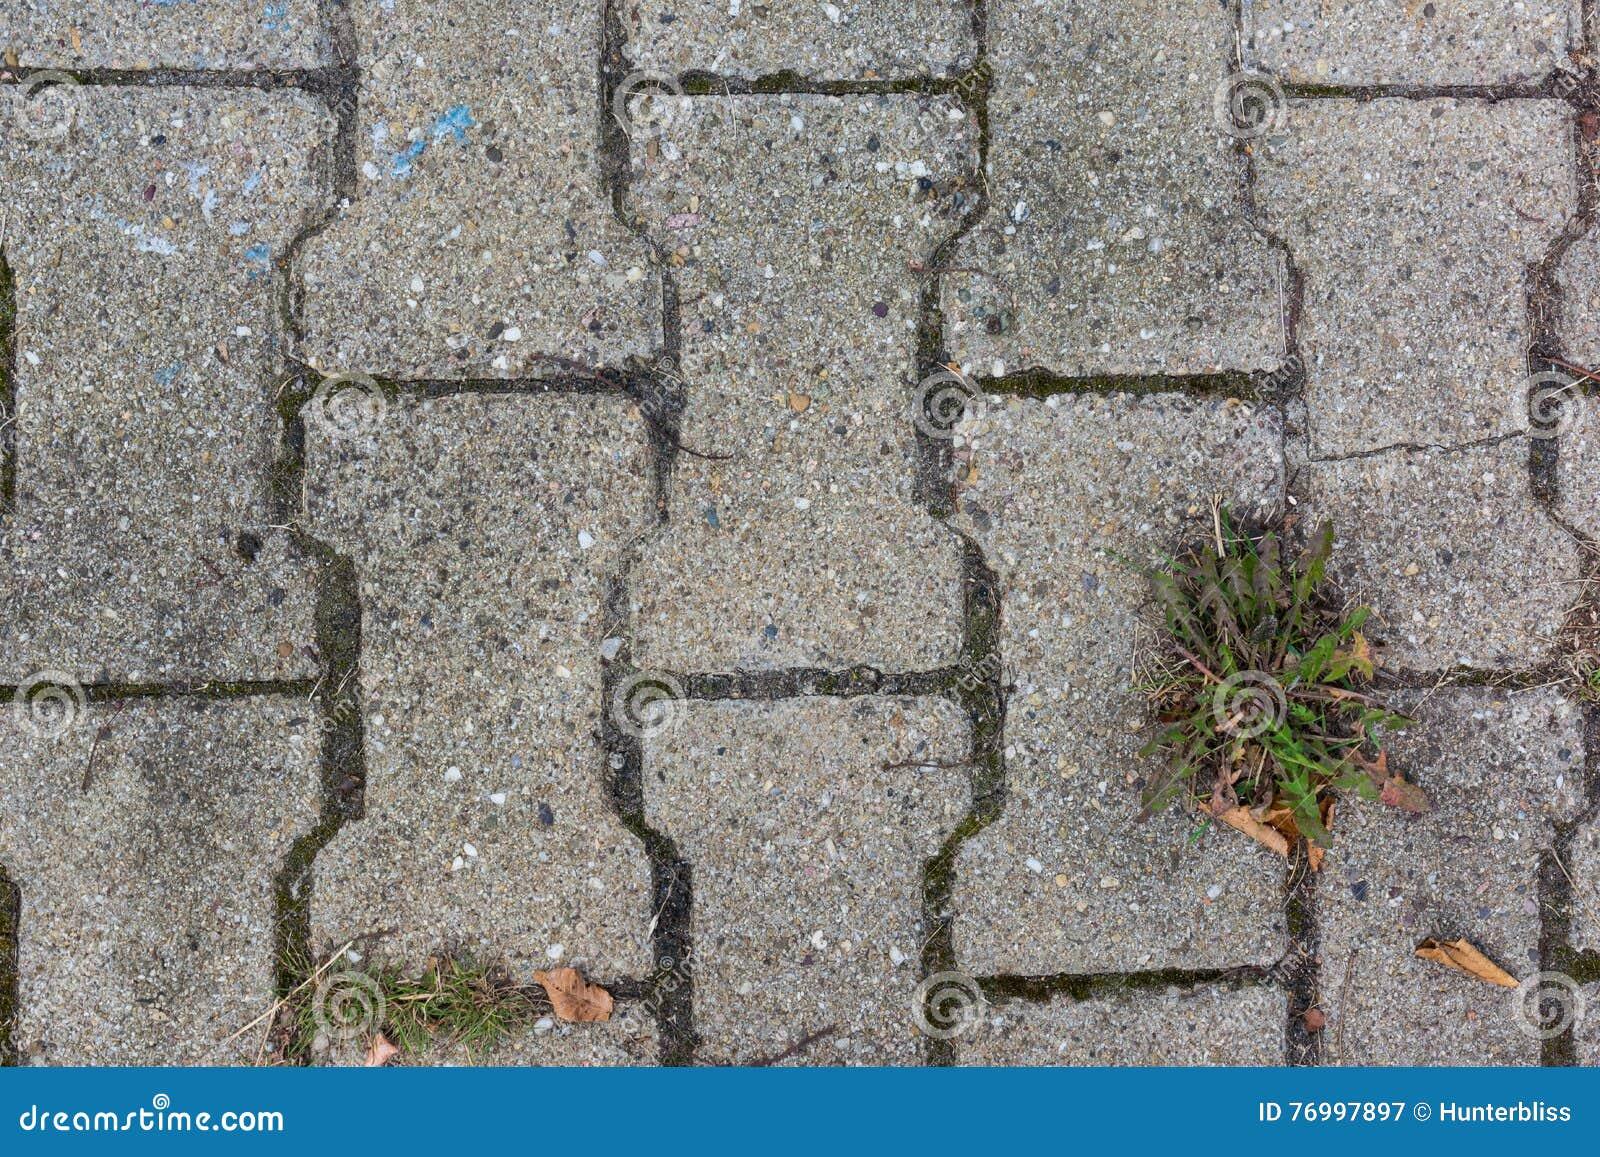 Mattonelle grey texture weed outdoors ruvido di pietra concreto